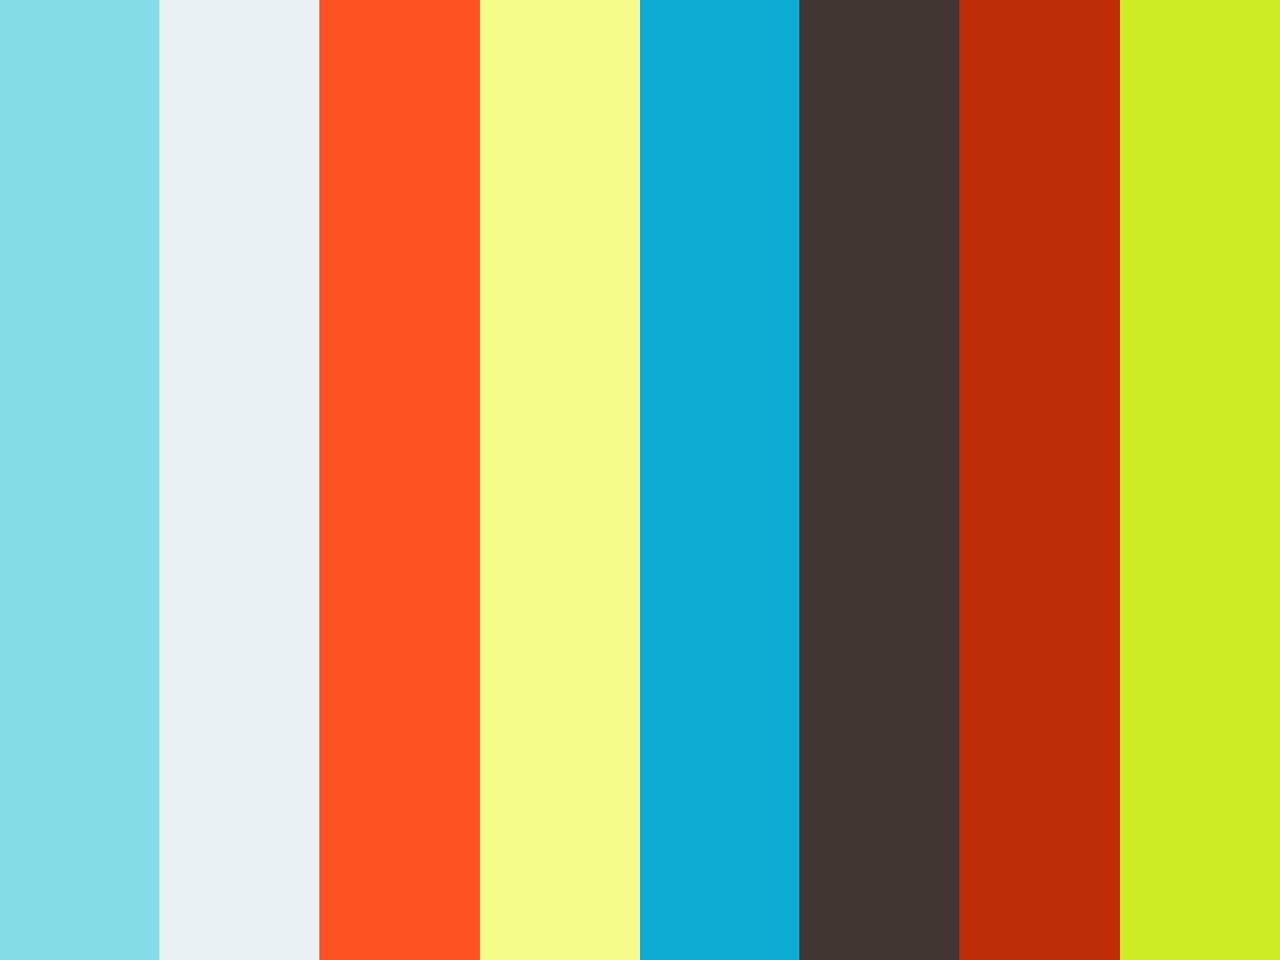 d2_300_-_1300_-_ELMSLN_Rethinking_systems_design_-_Bryan_Ollendyke on Vimeo